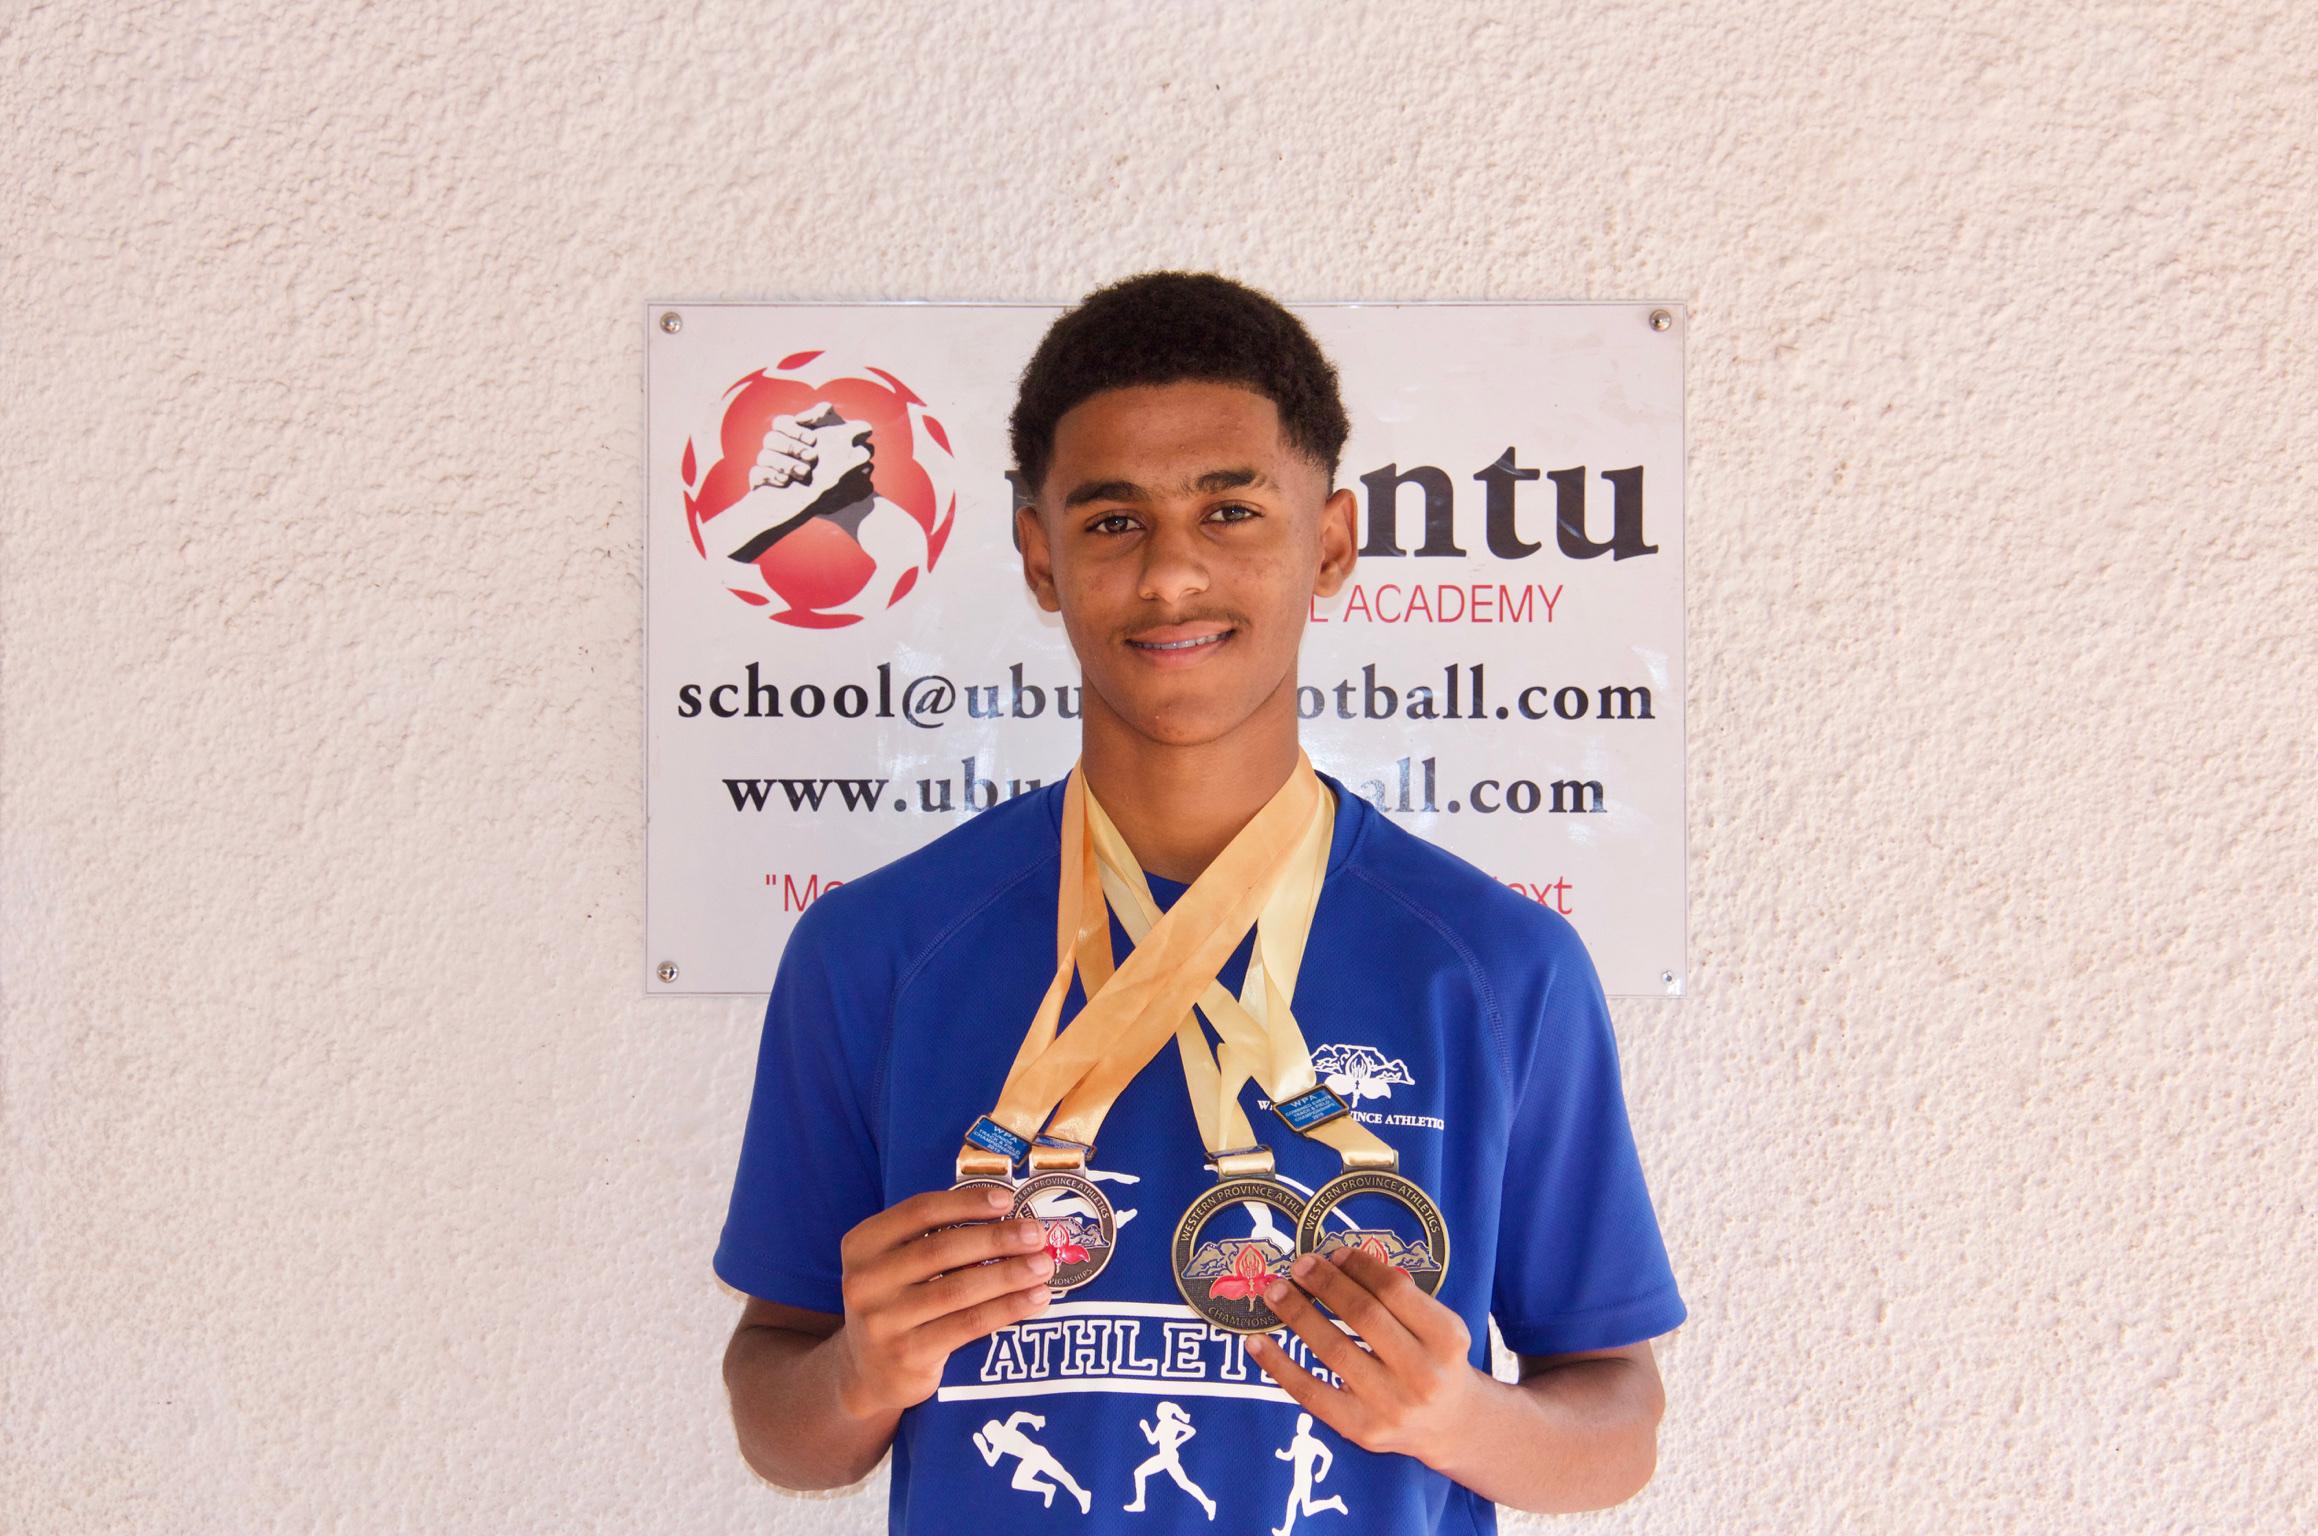 Duwayne holding his decathlon medals.